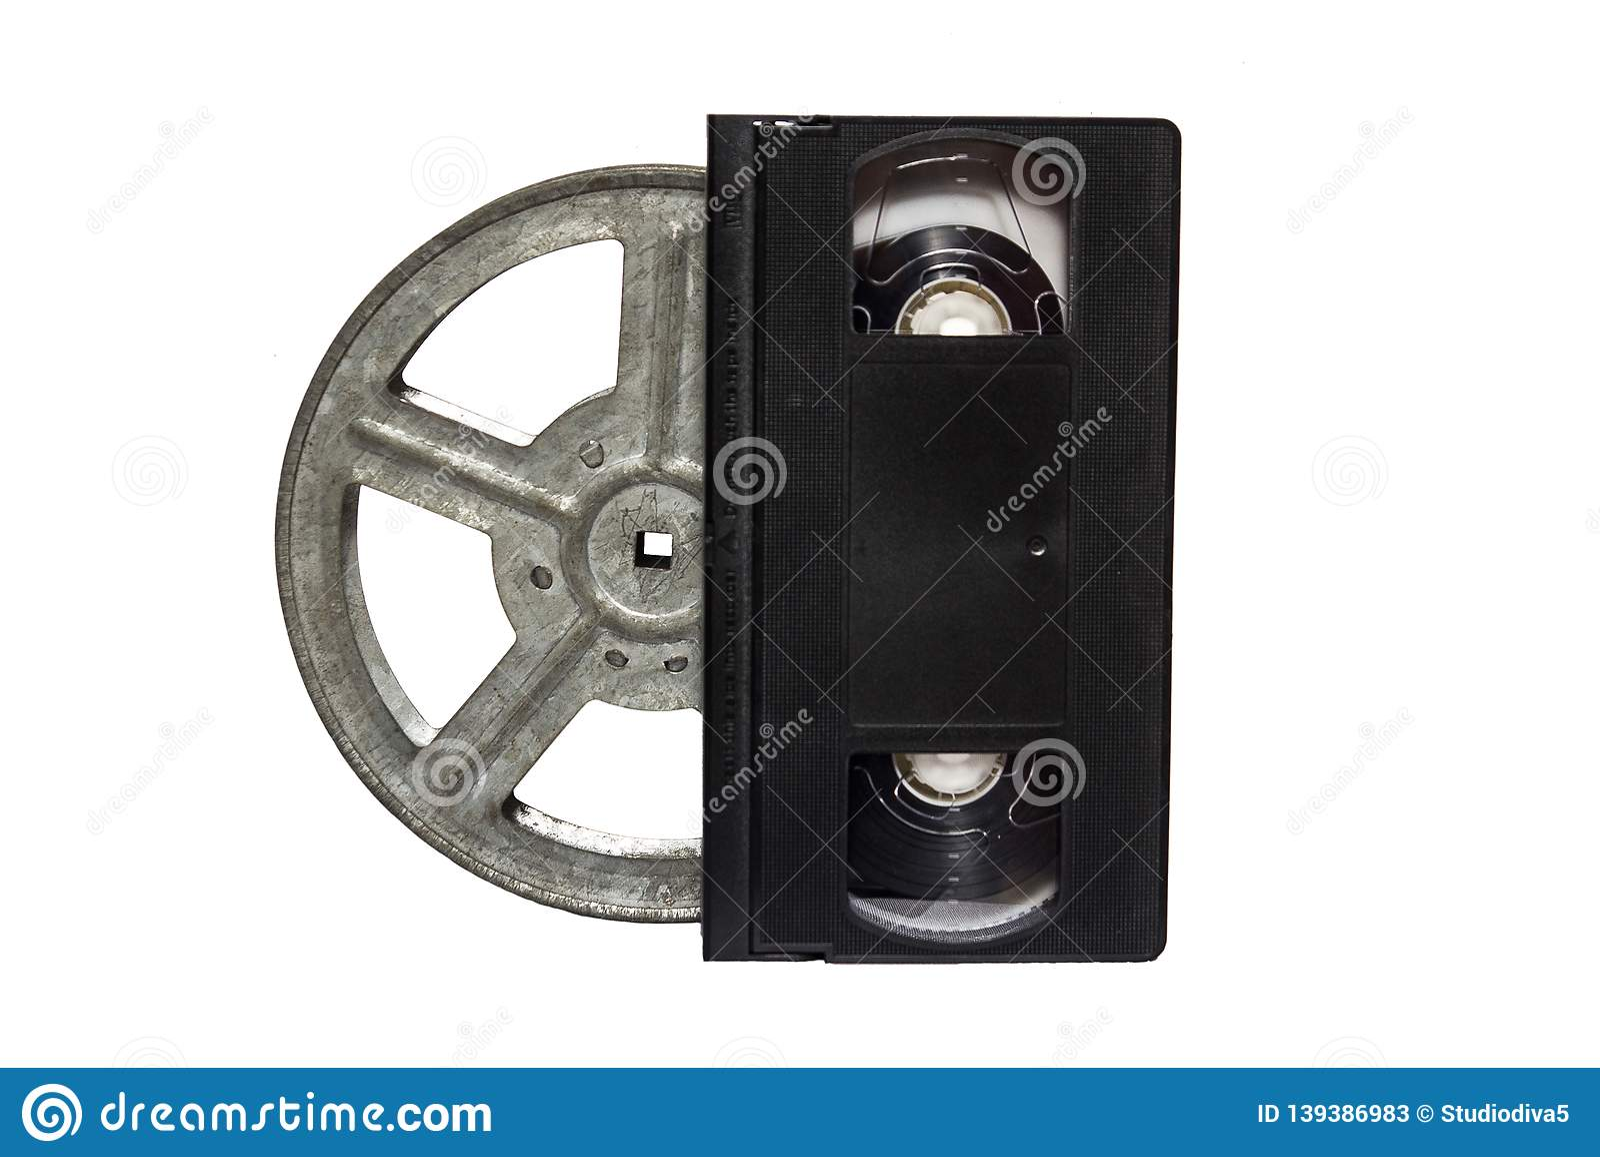 reel of film on white background